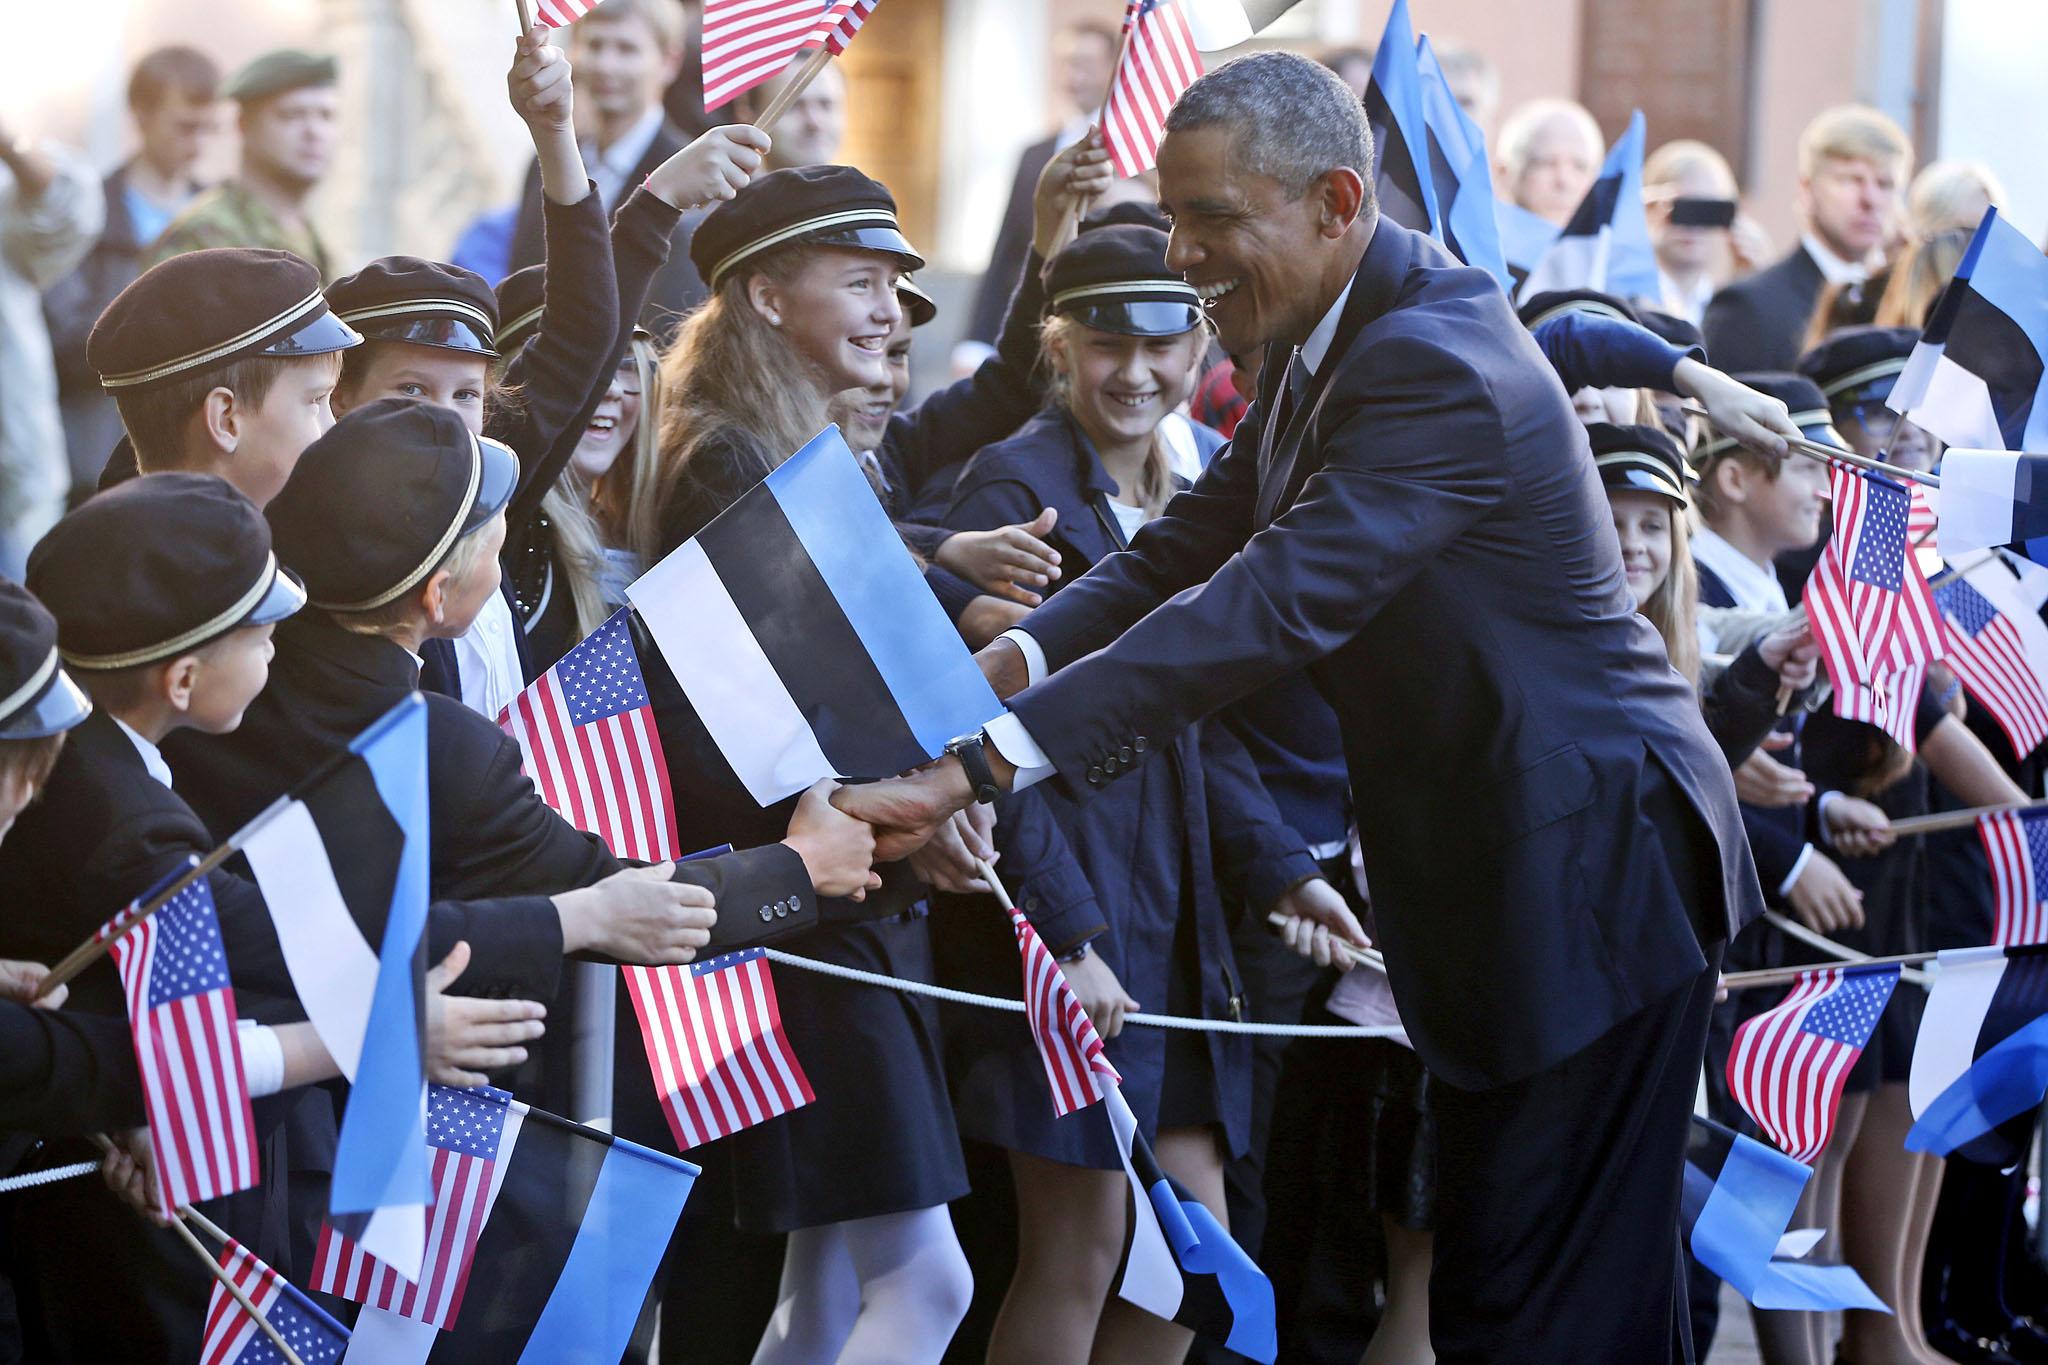 https://obamadiary.files.wordpress.com/2014/12/obama.jpg&#8221